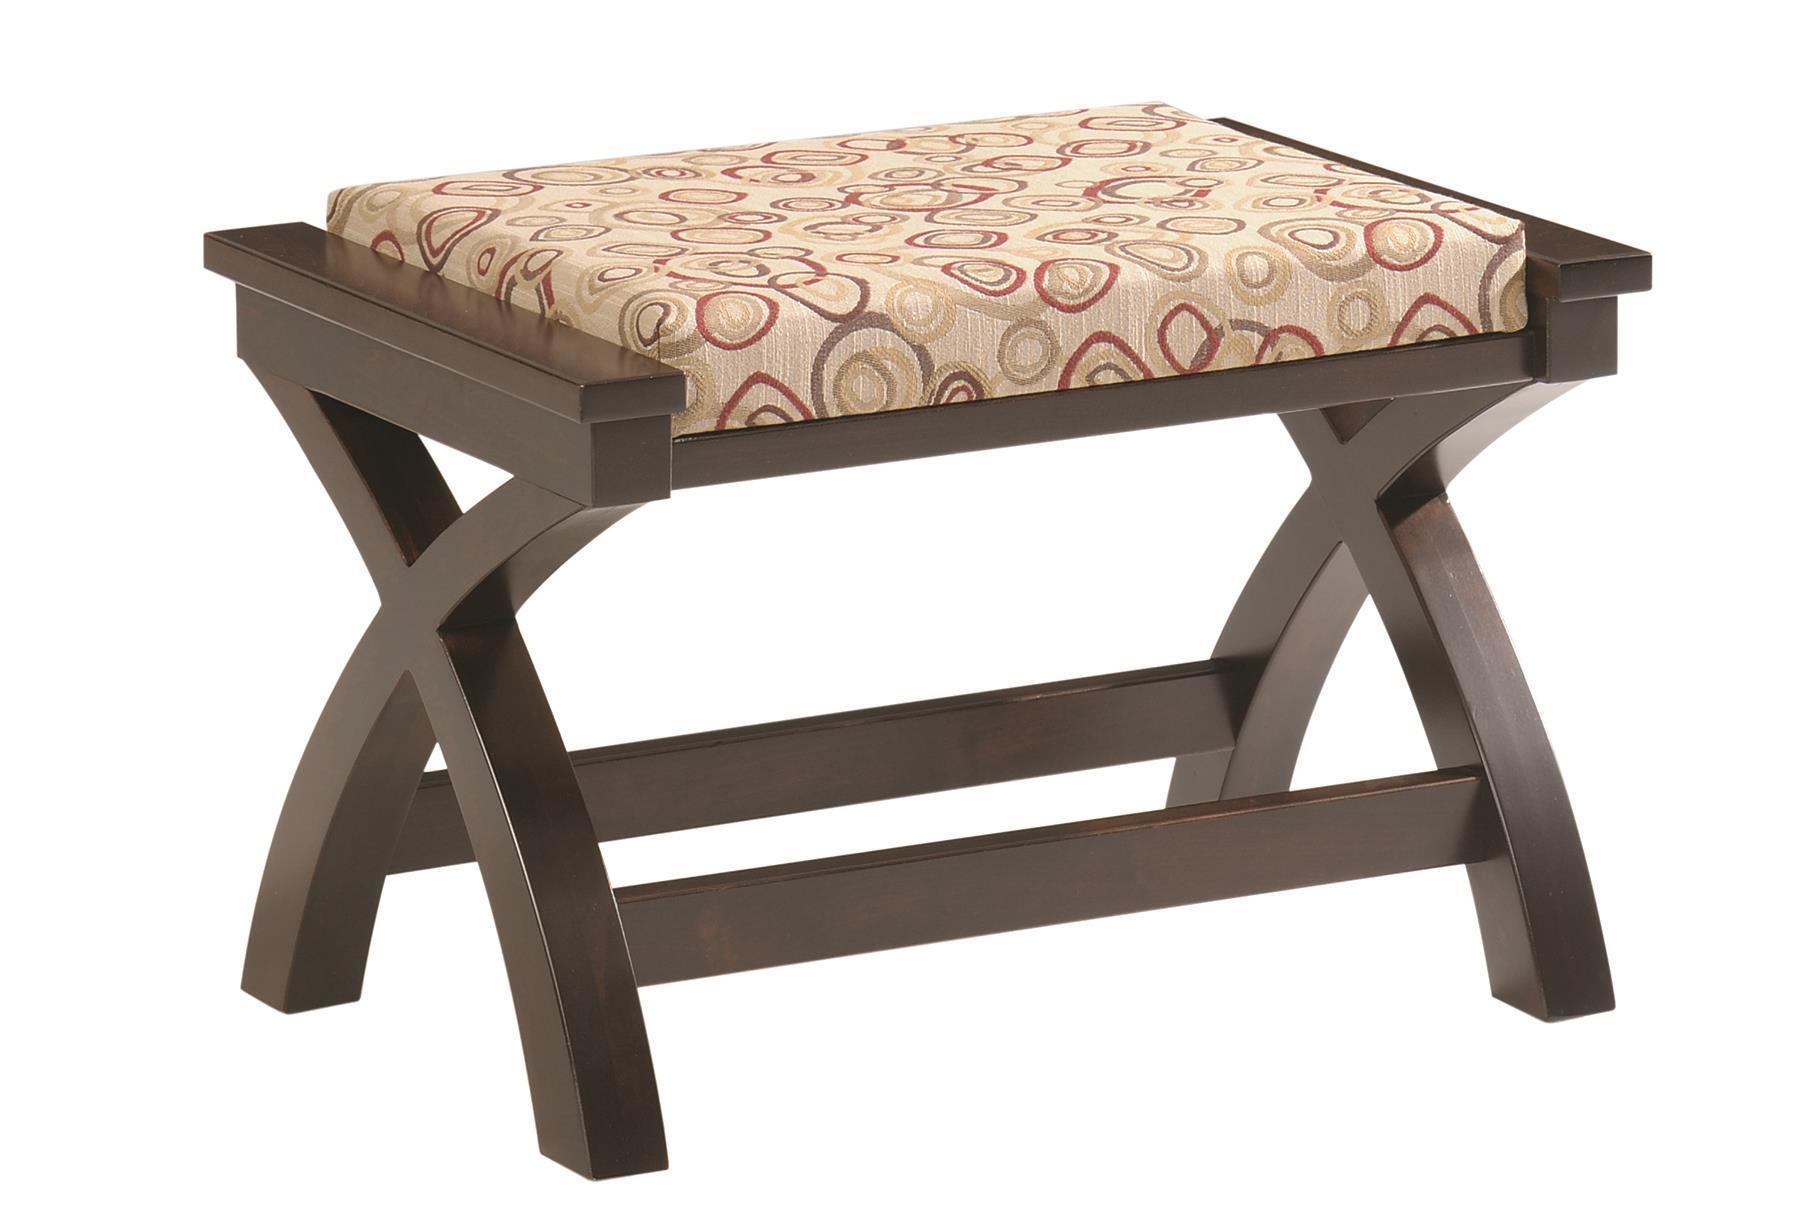 Amish furniture of bristol - Amish Furniture Of Bristol 20